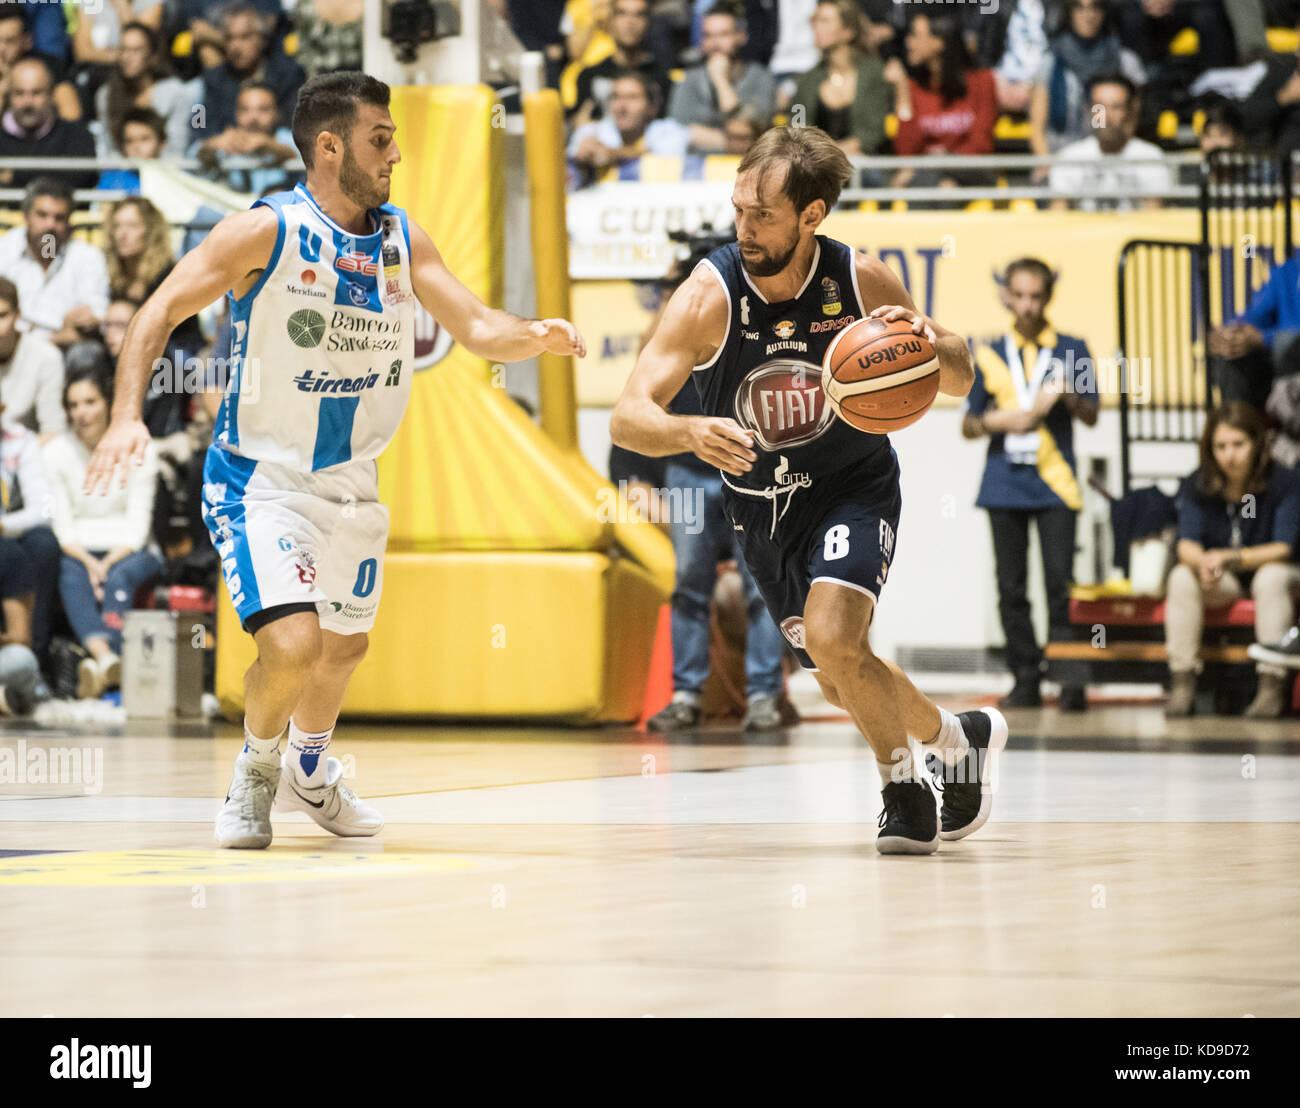 Turin, Italy 7th october 2017. Giuseppe Poeta during the Serie A an Basketball match Fiat Torino Auxilium vs Dinamo Stock Photo